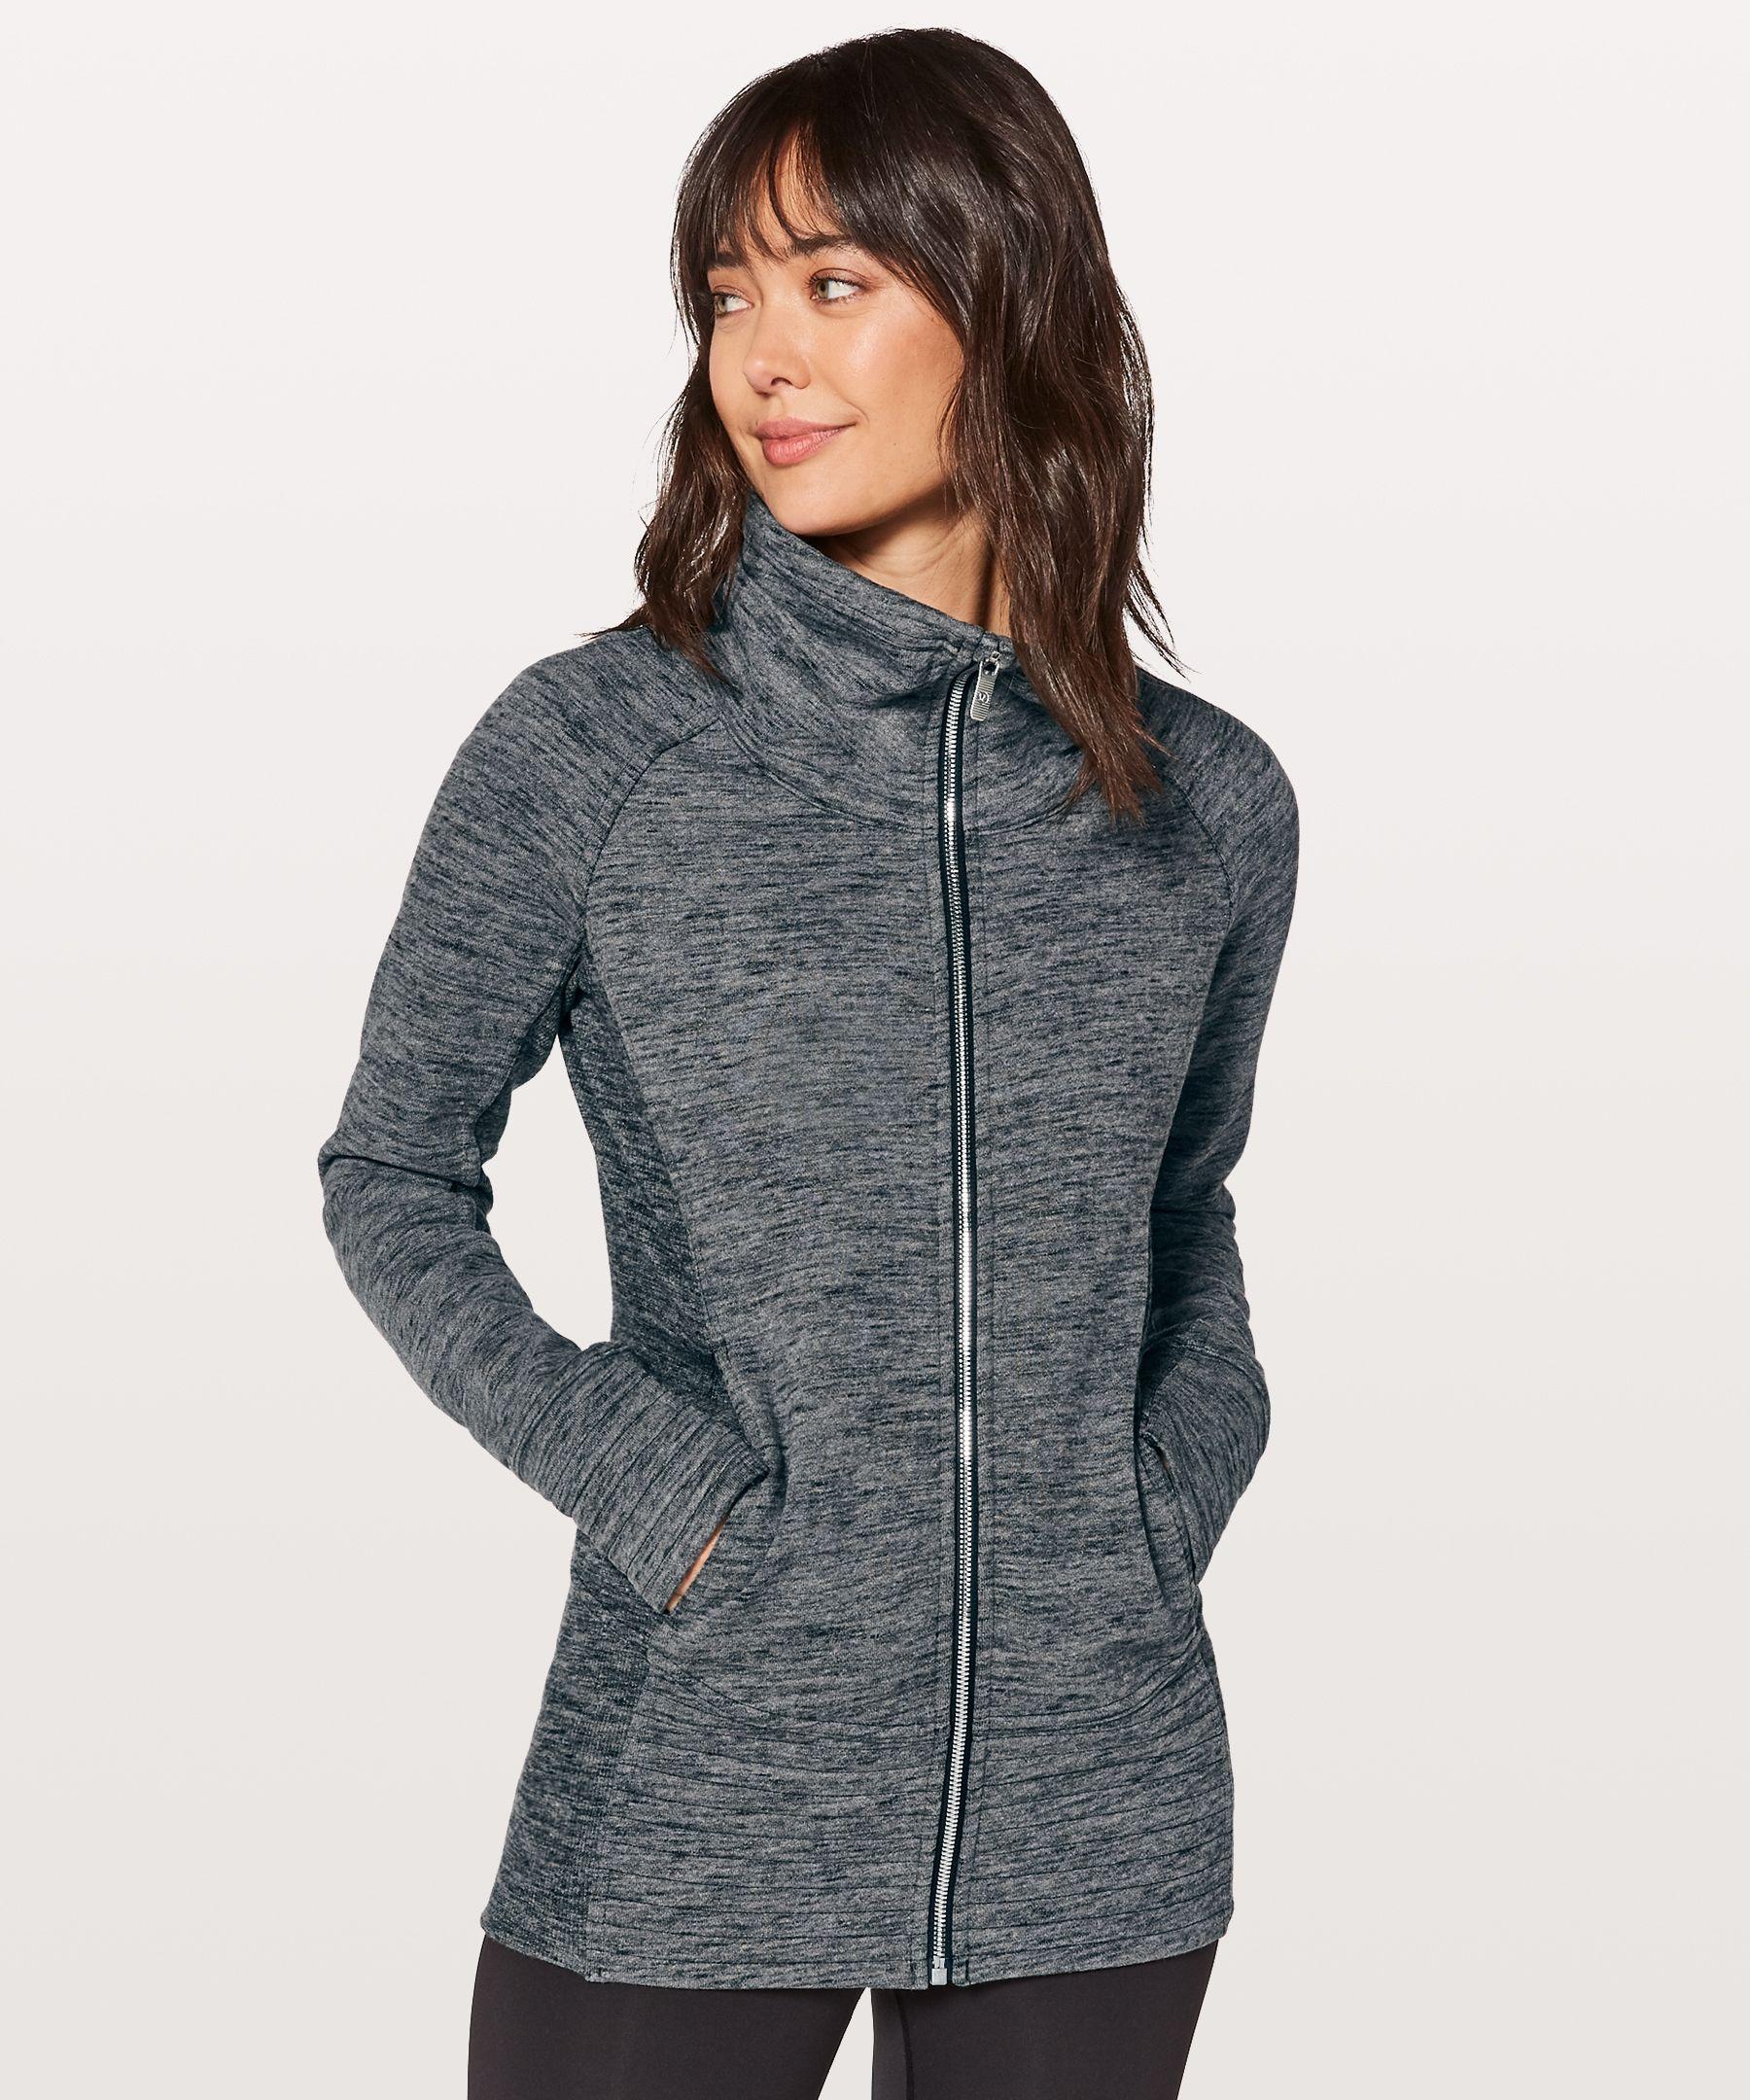 Radiant Jacket Ii Heathered Core Grey Slim Fit Hoodie Activewear Jackets Jackets [ 2160 x 1800 Pixel ]